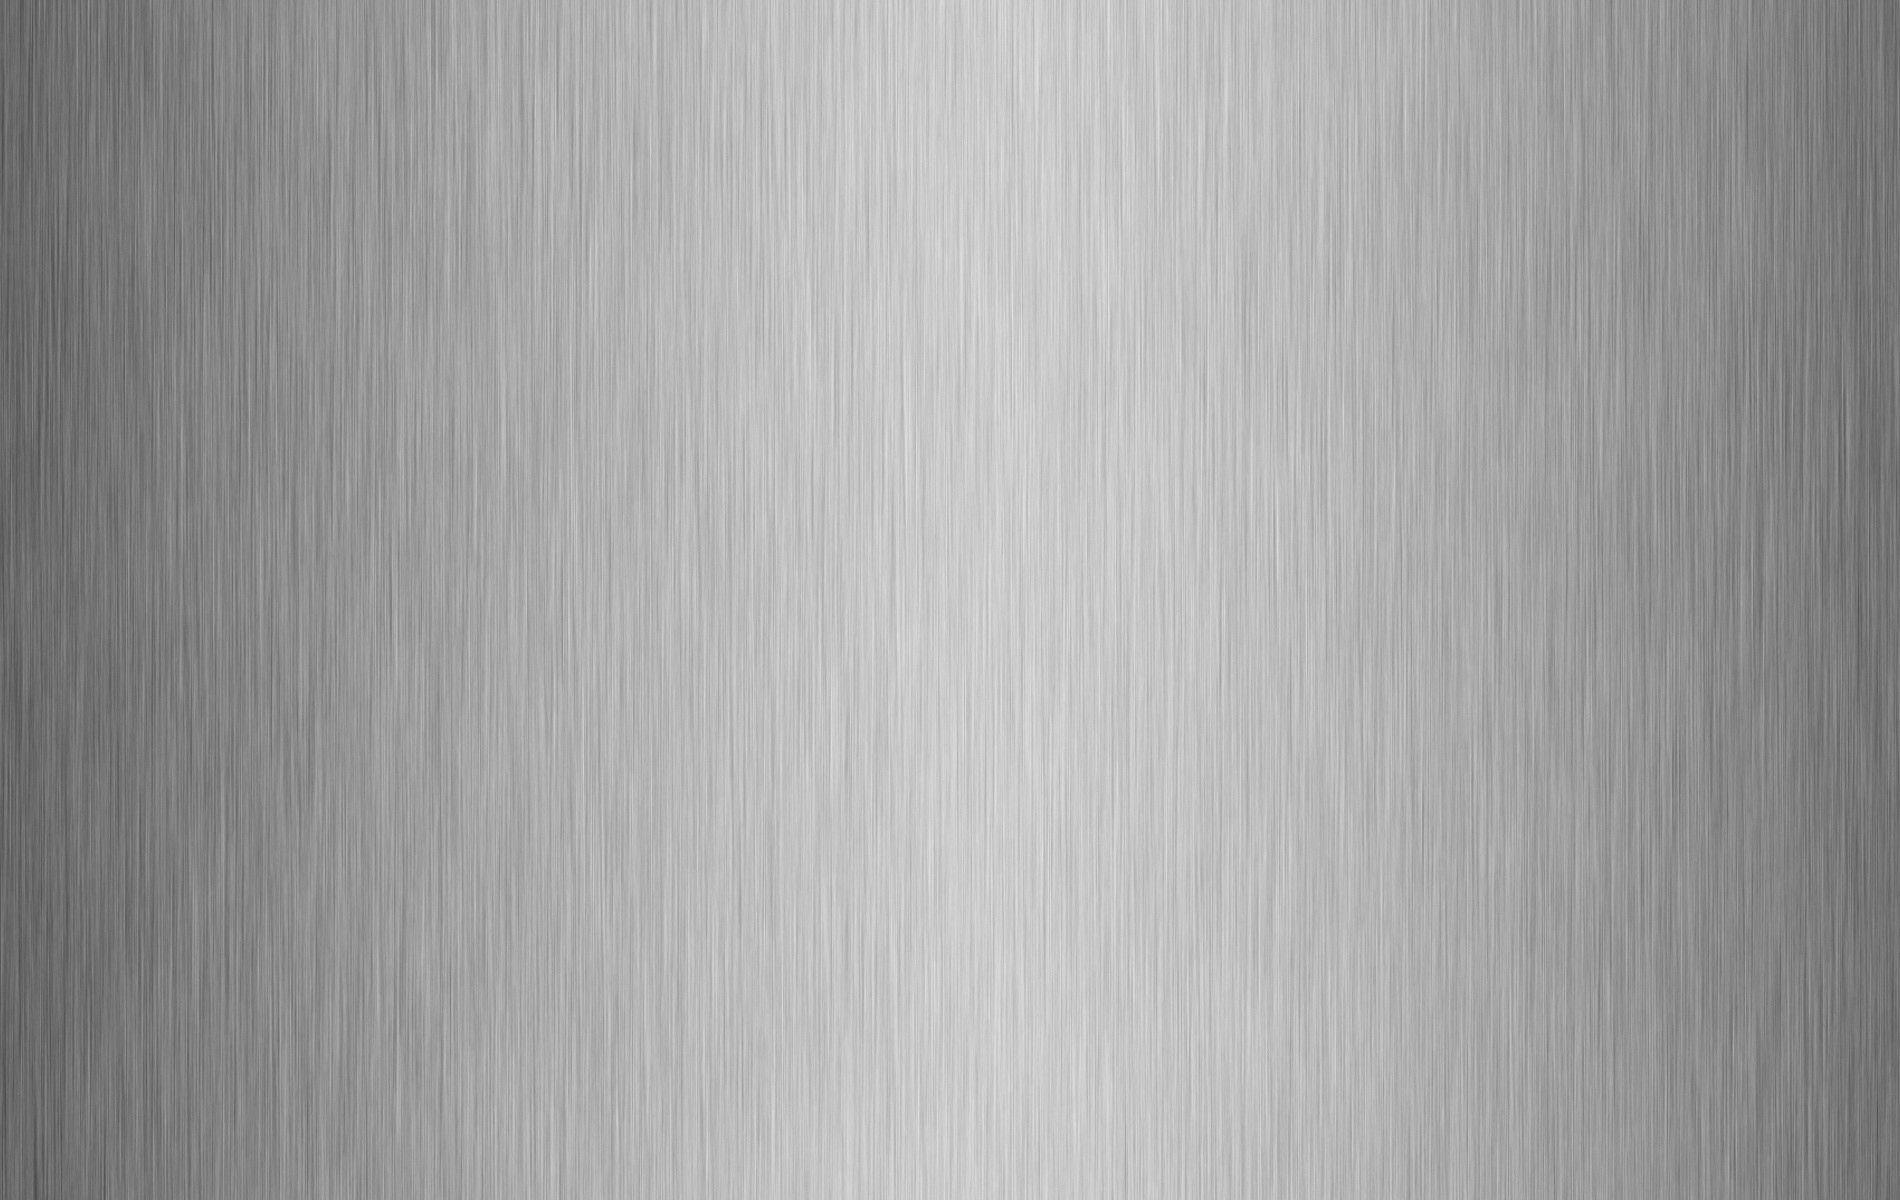 Silver Desktop Backgrounds Wallpaper Cave